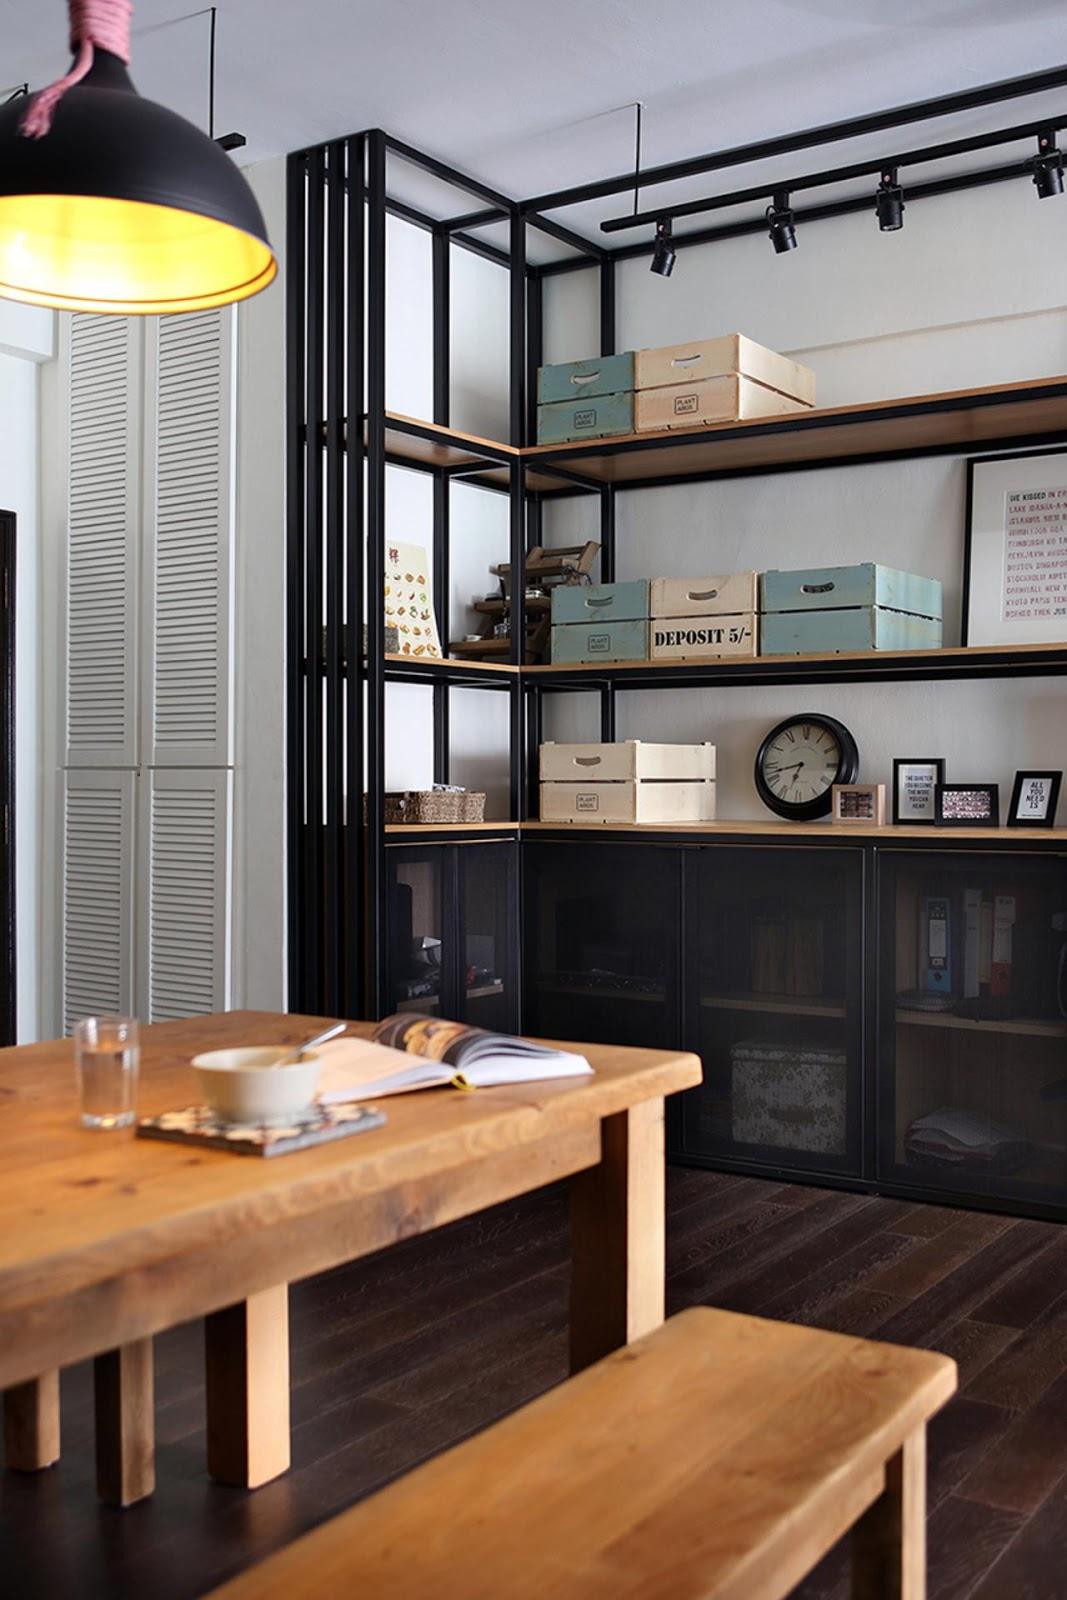 Home Design Ideas Malaysia: Malaysia Home Renovation Blog: Condo House Idea 11: The